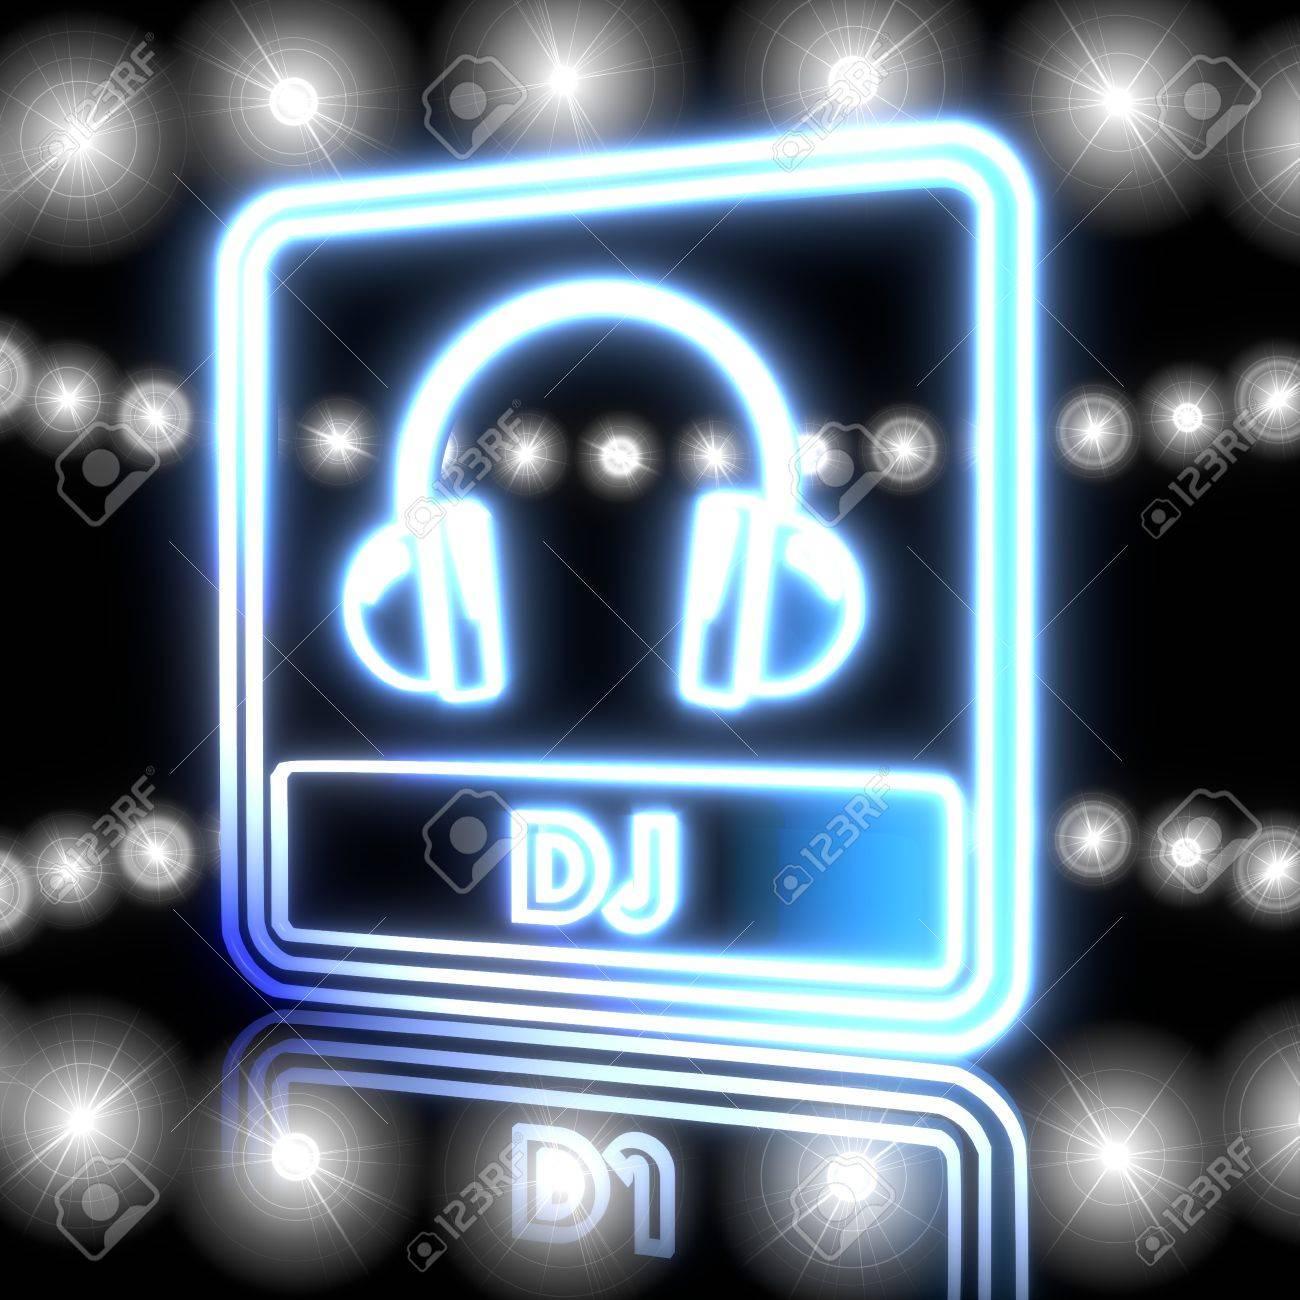 Cool Black Neon Headphones 3d Graphic With Magic Dj Symbol Shining Effect Lights Stock Photo